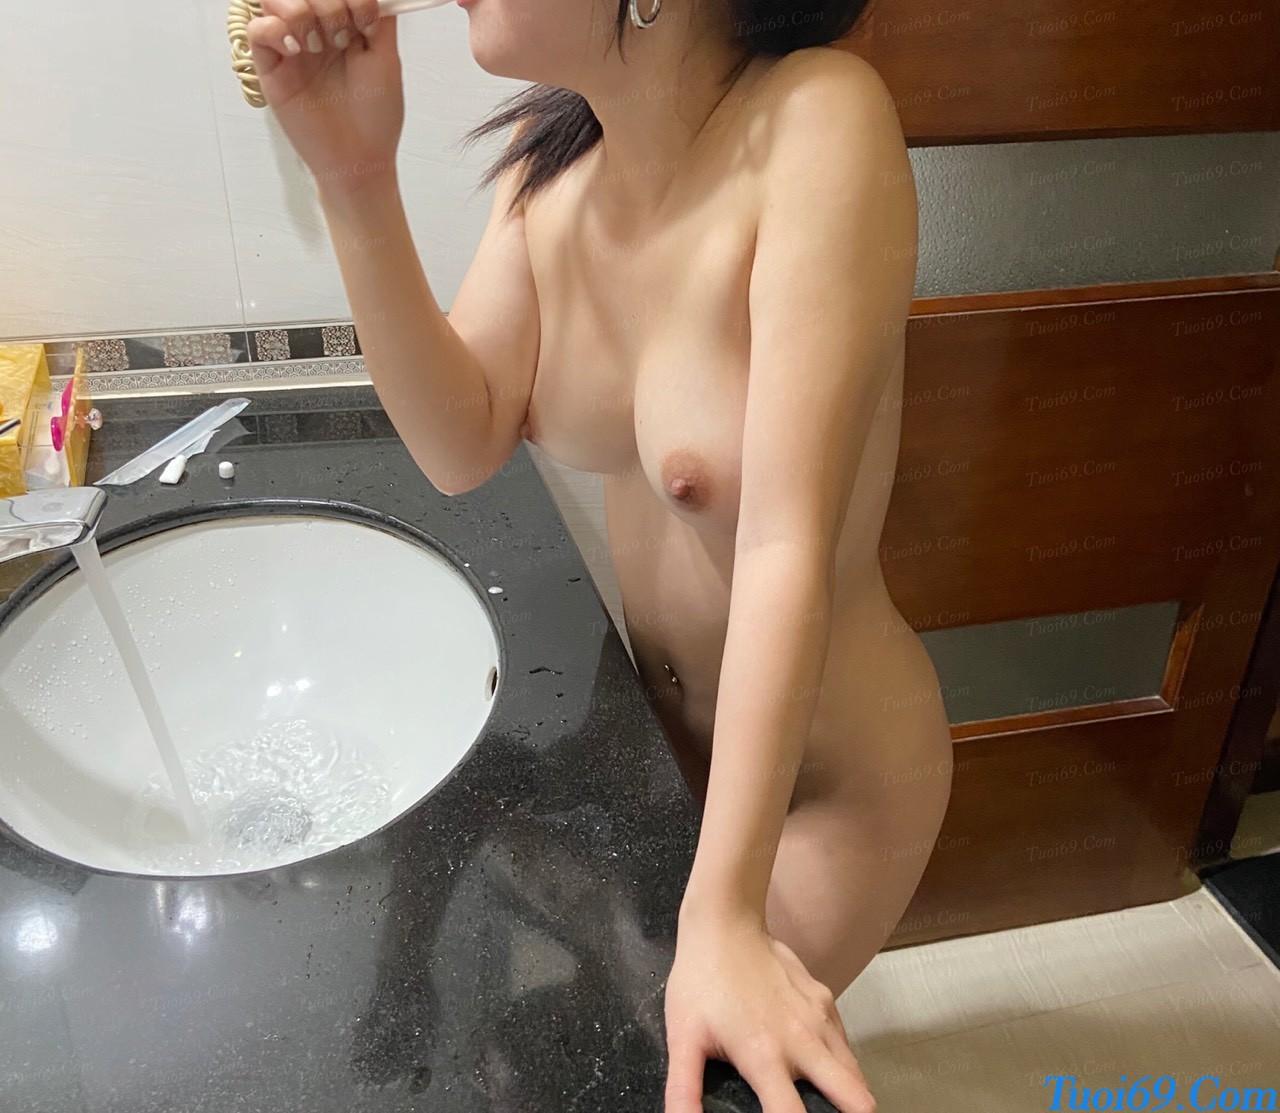 tuoi69com-review-em-gai-goi-hae-ri-thien-than-xinh-dep-quyen-ru-nhu-jav-star-9